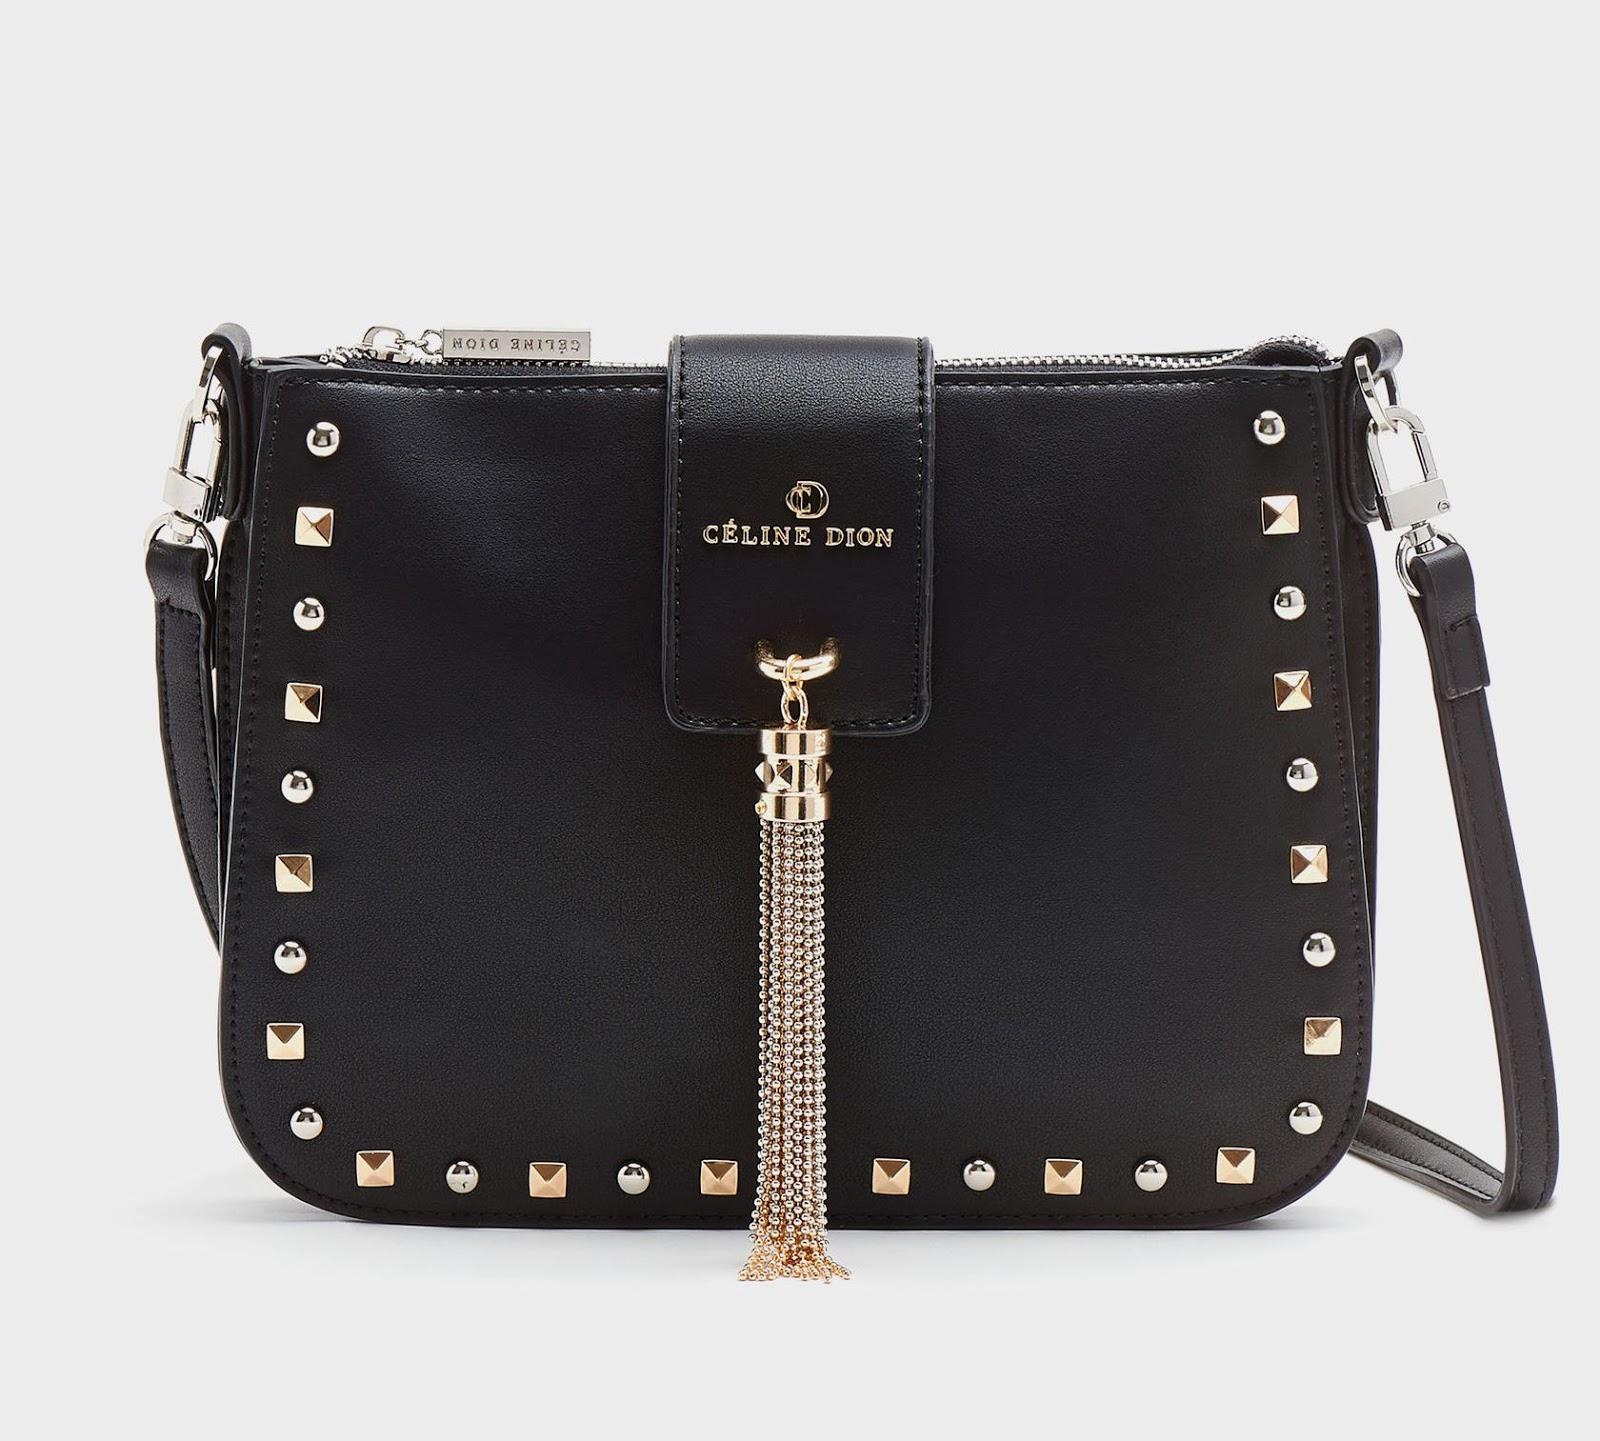 5ec6c973c0e6 Céline Dion – Cadenza Collection Small Square Studded Shiny Faux-Leather  Purse